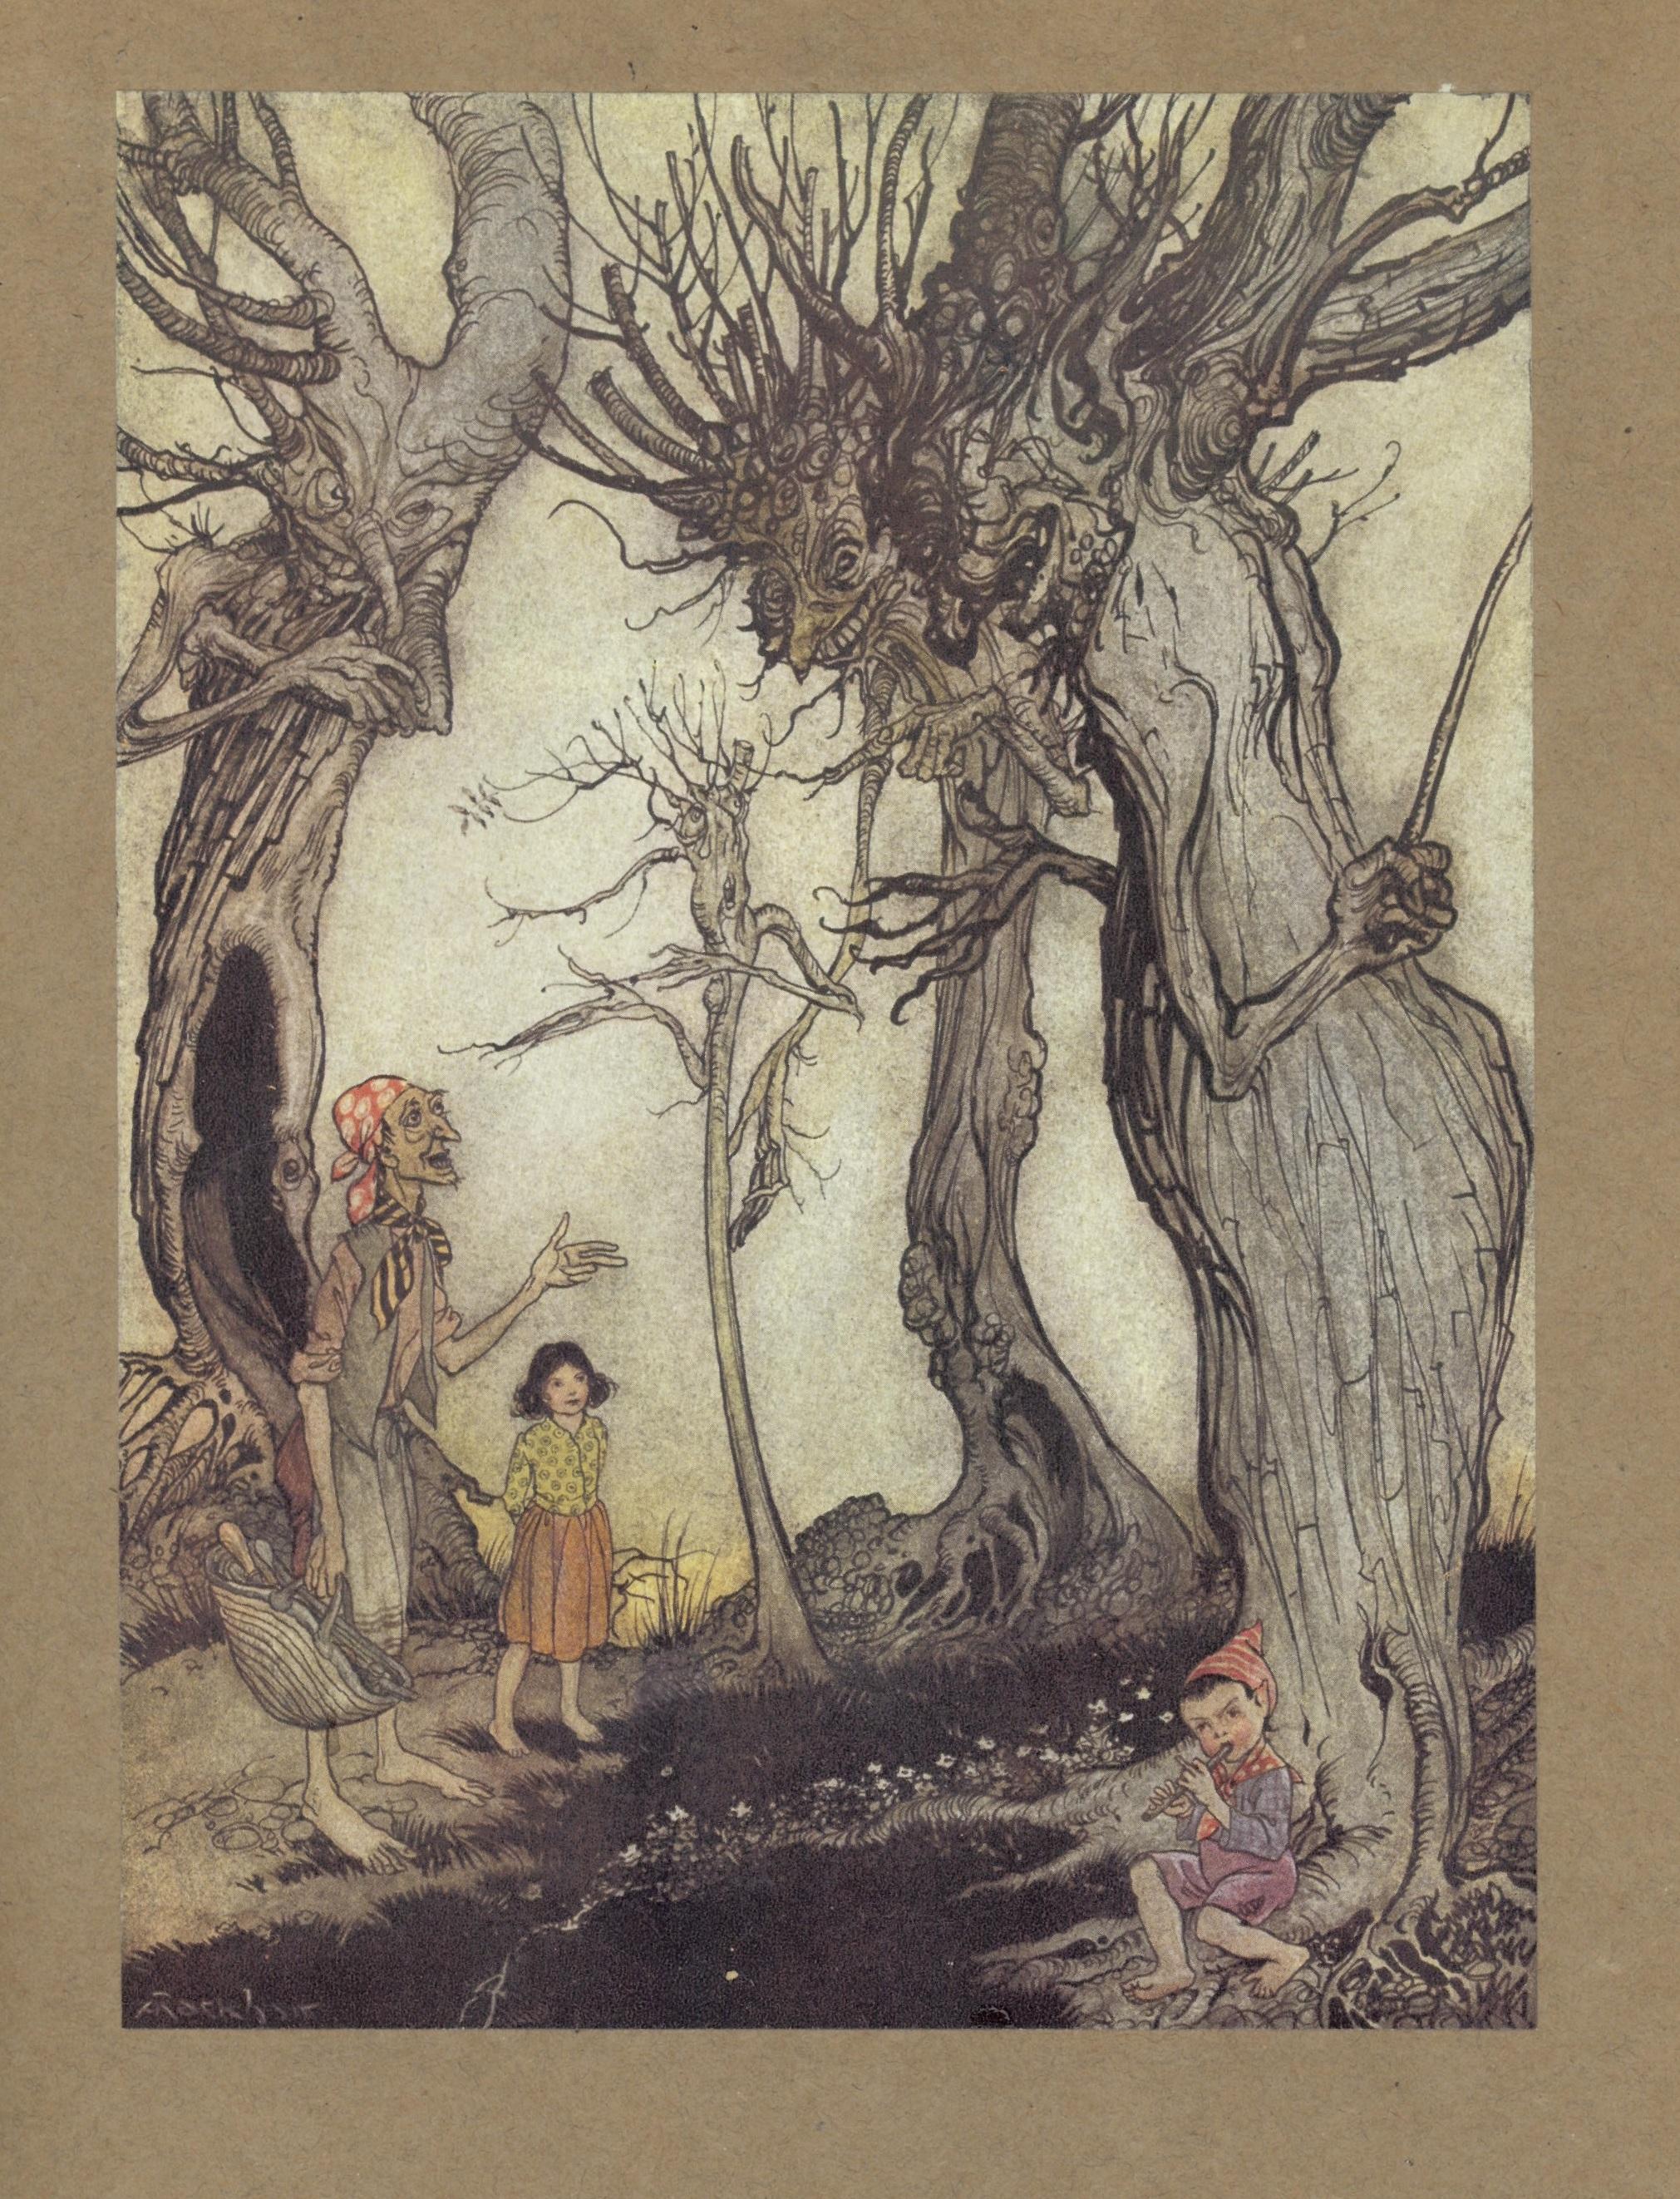 Illustrating Camelot